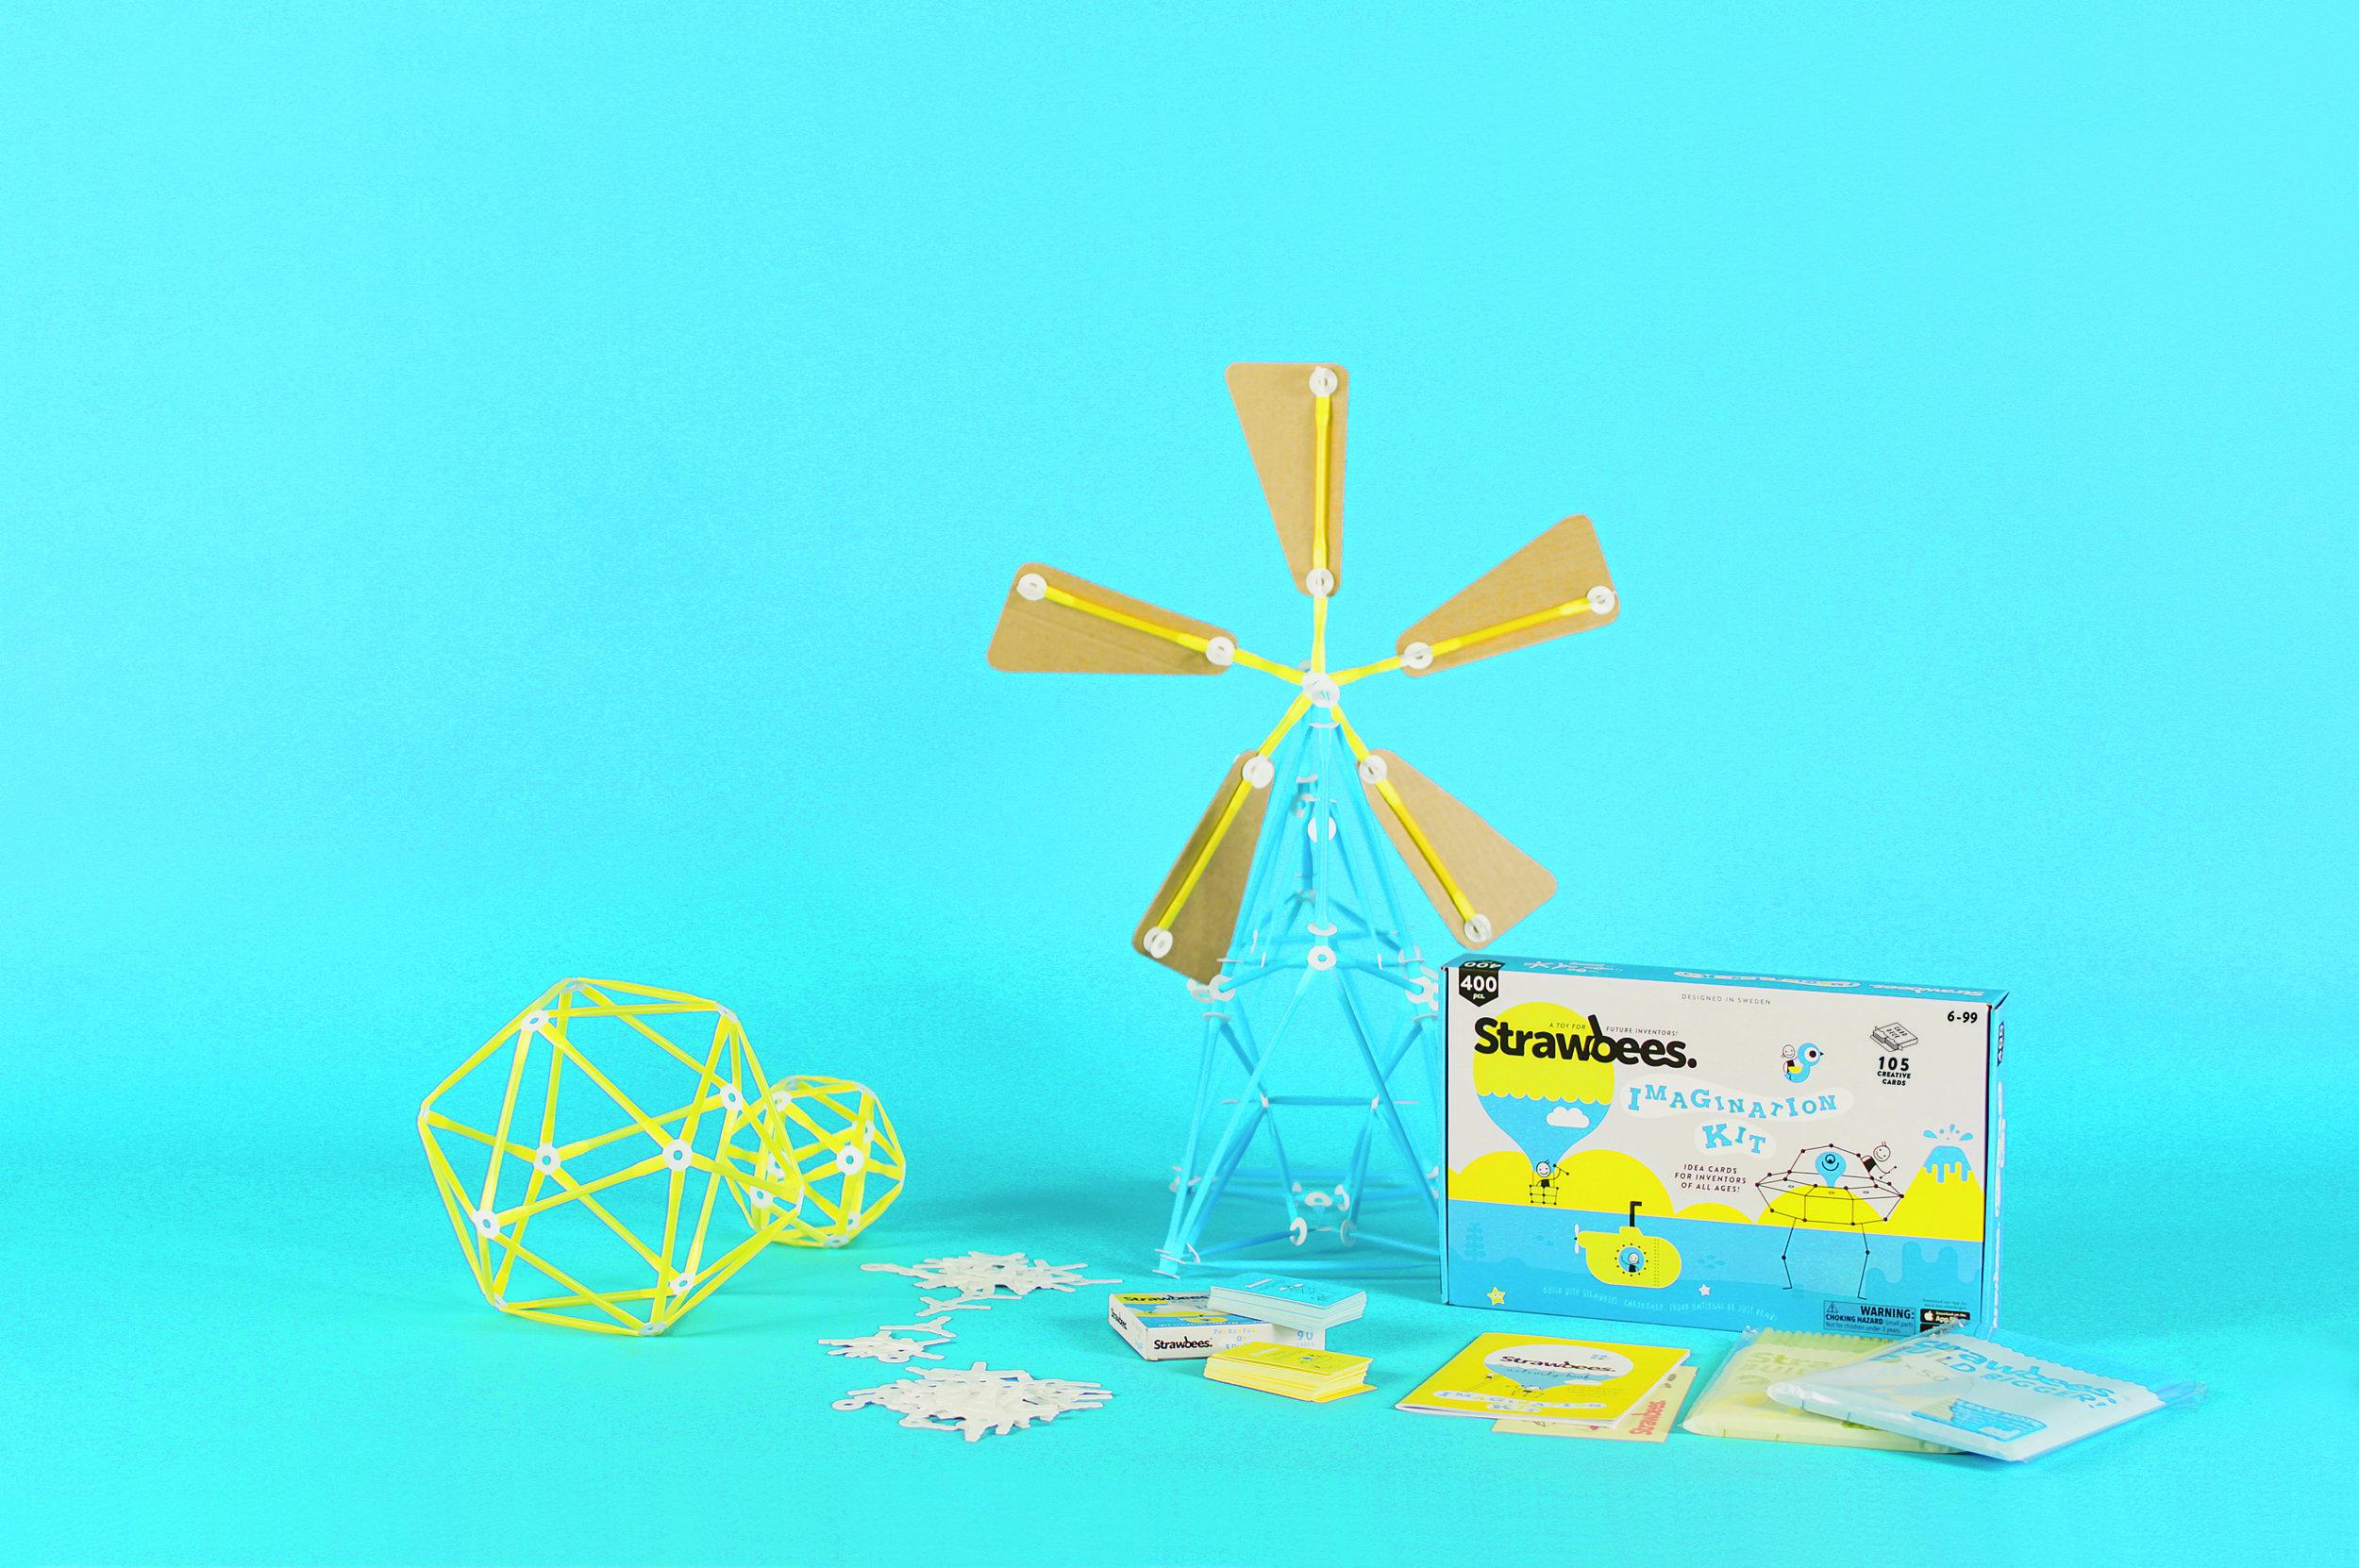 Strawbees Imagination kit set 2.jpg